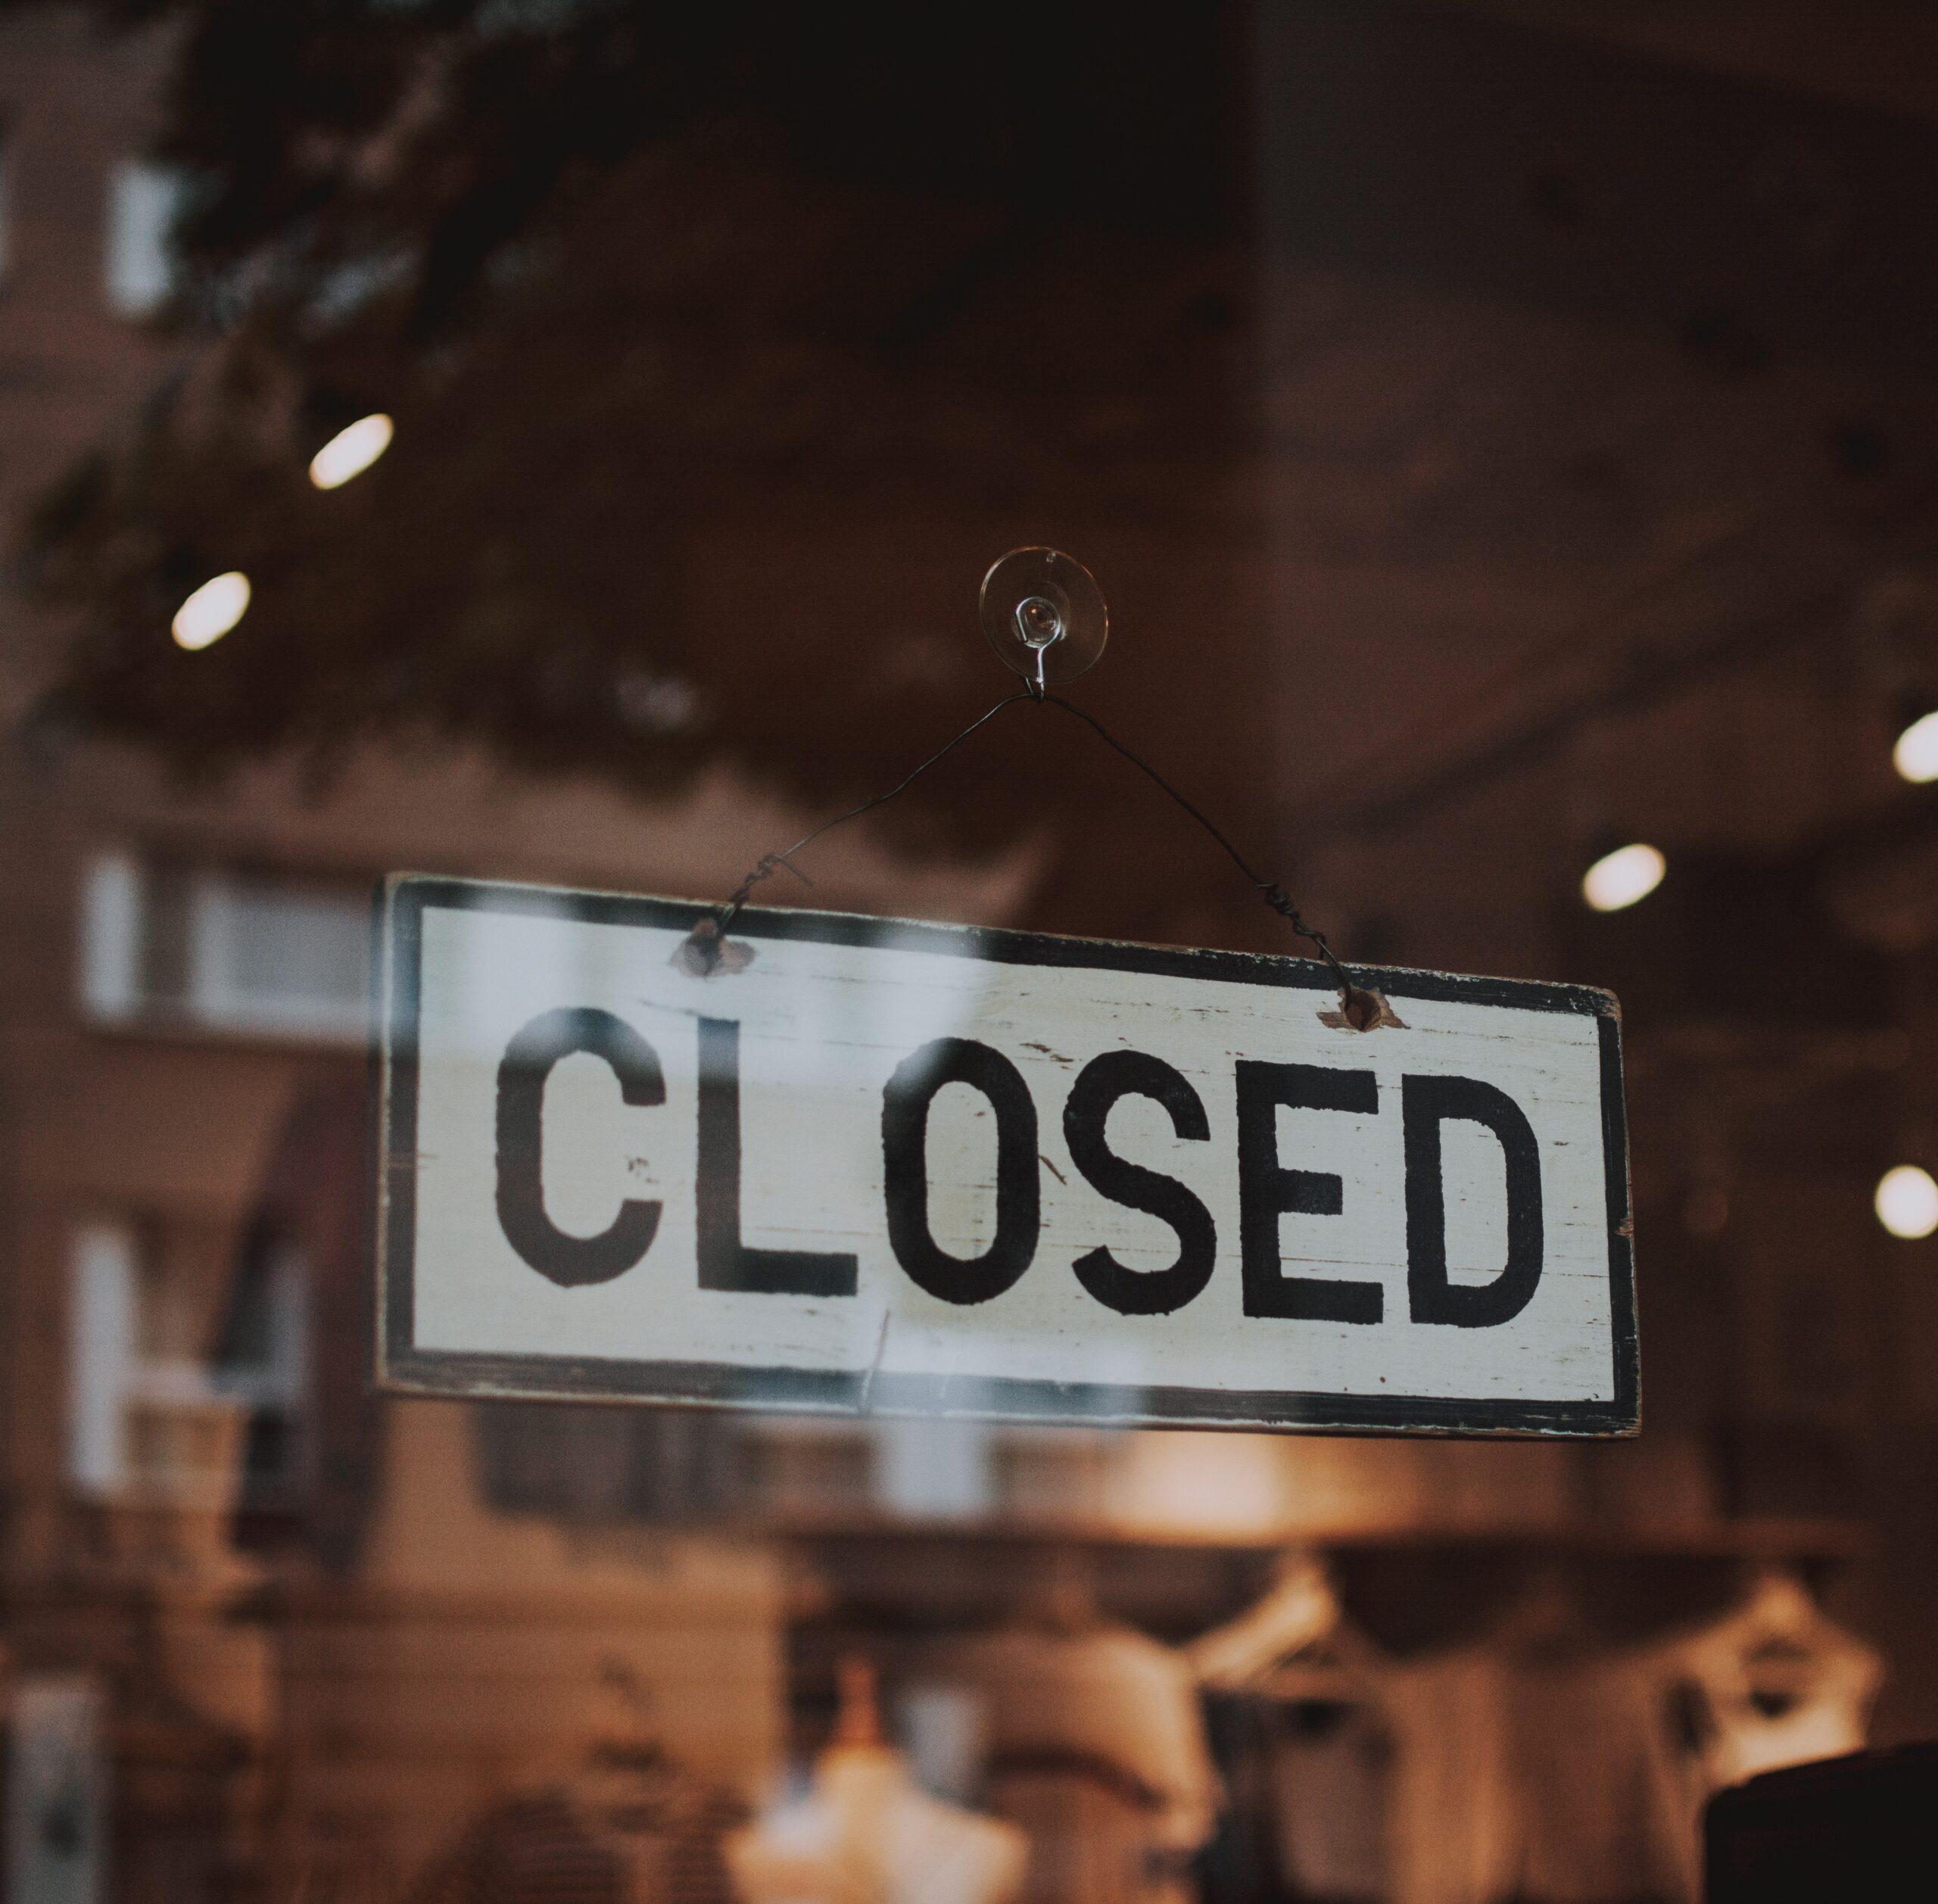 Closed due to Legionella